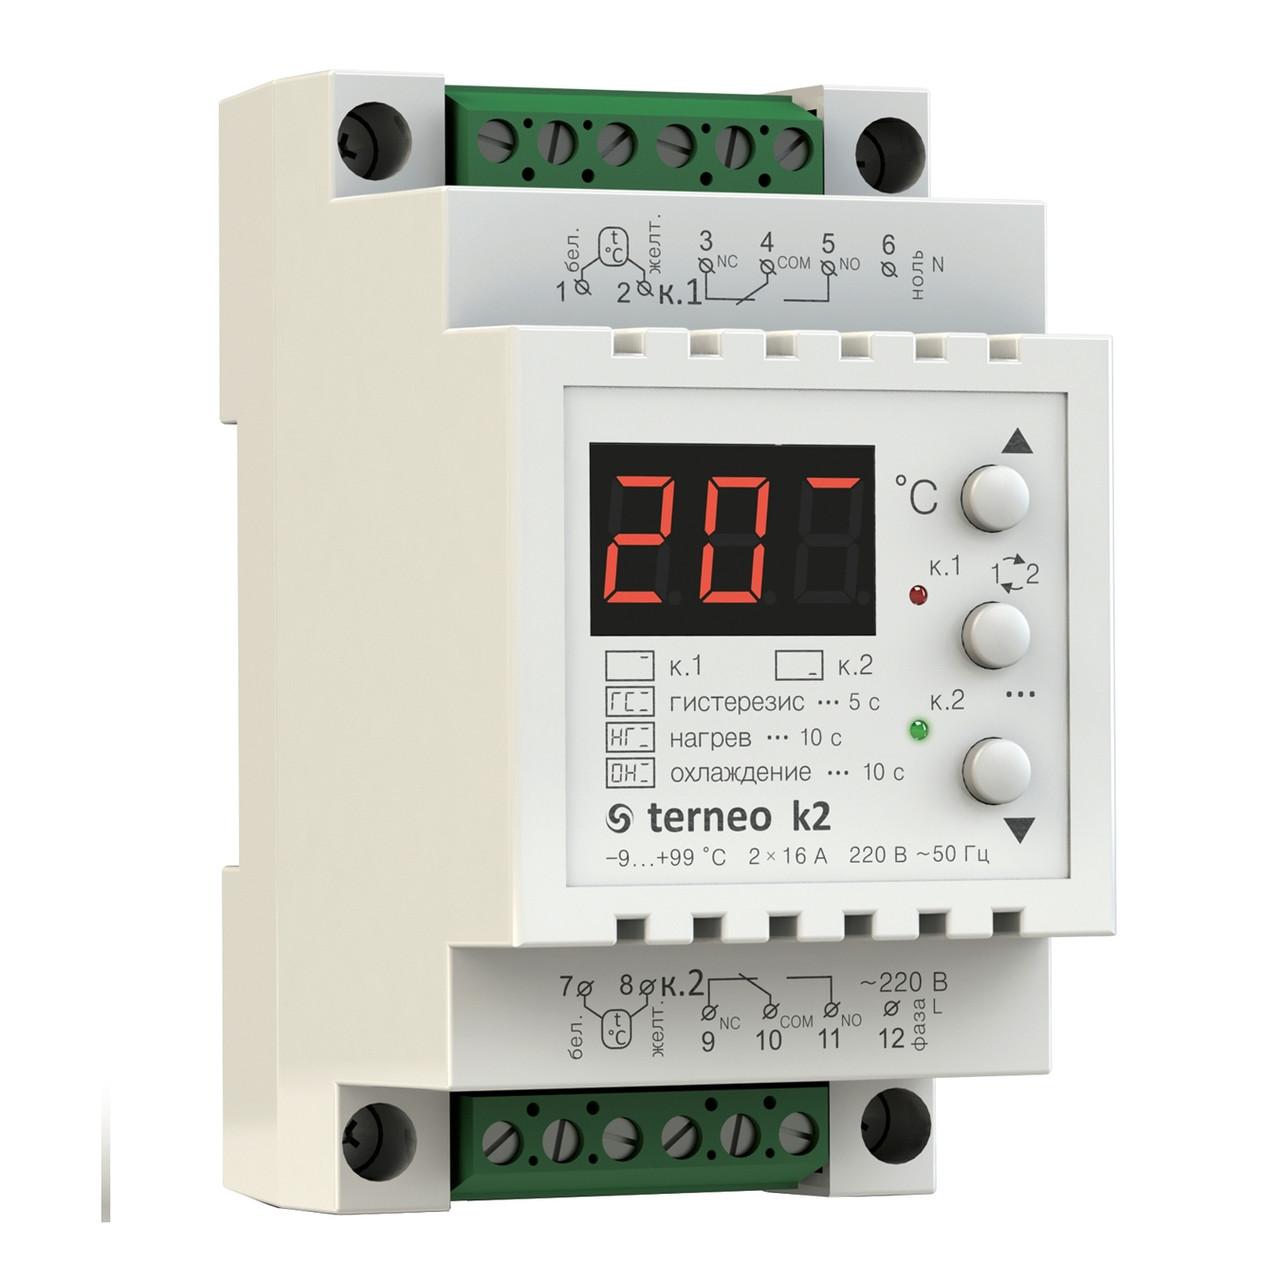 Терморегулятор для тёплого пола на DIN рейку, двухзональный Terneo k2